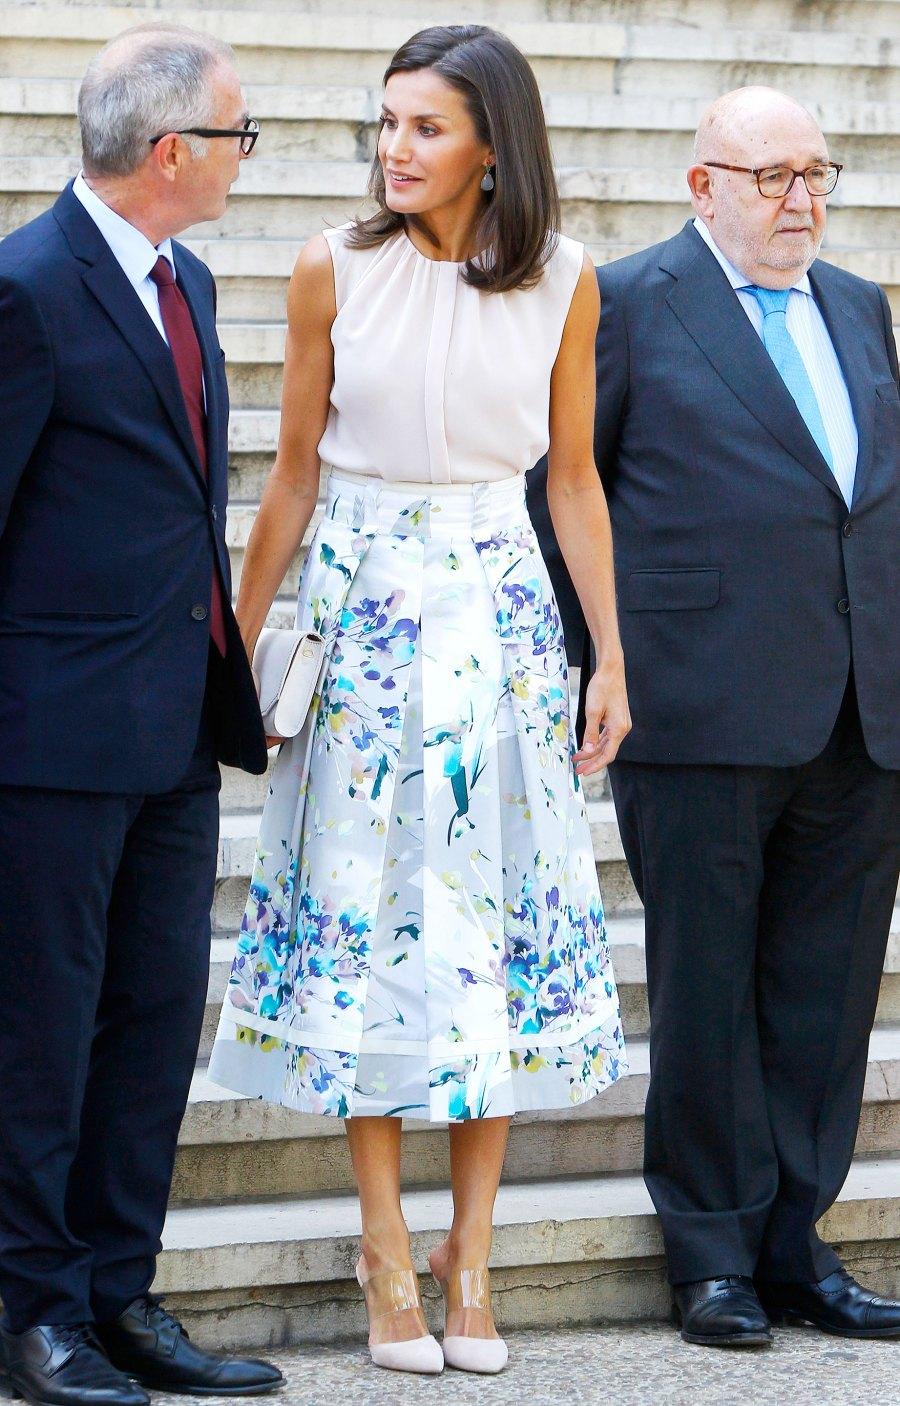 Queen Letizia Floral Skirt July 30, 2019